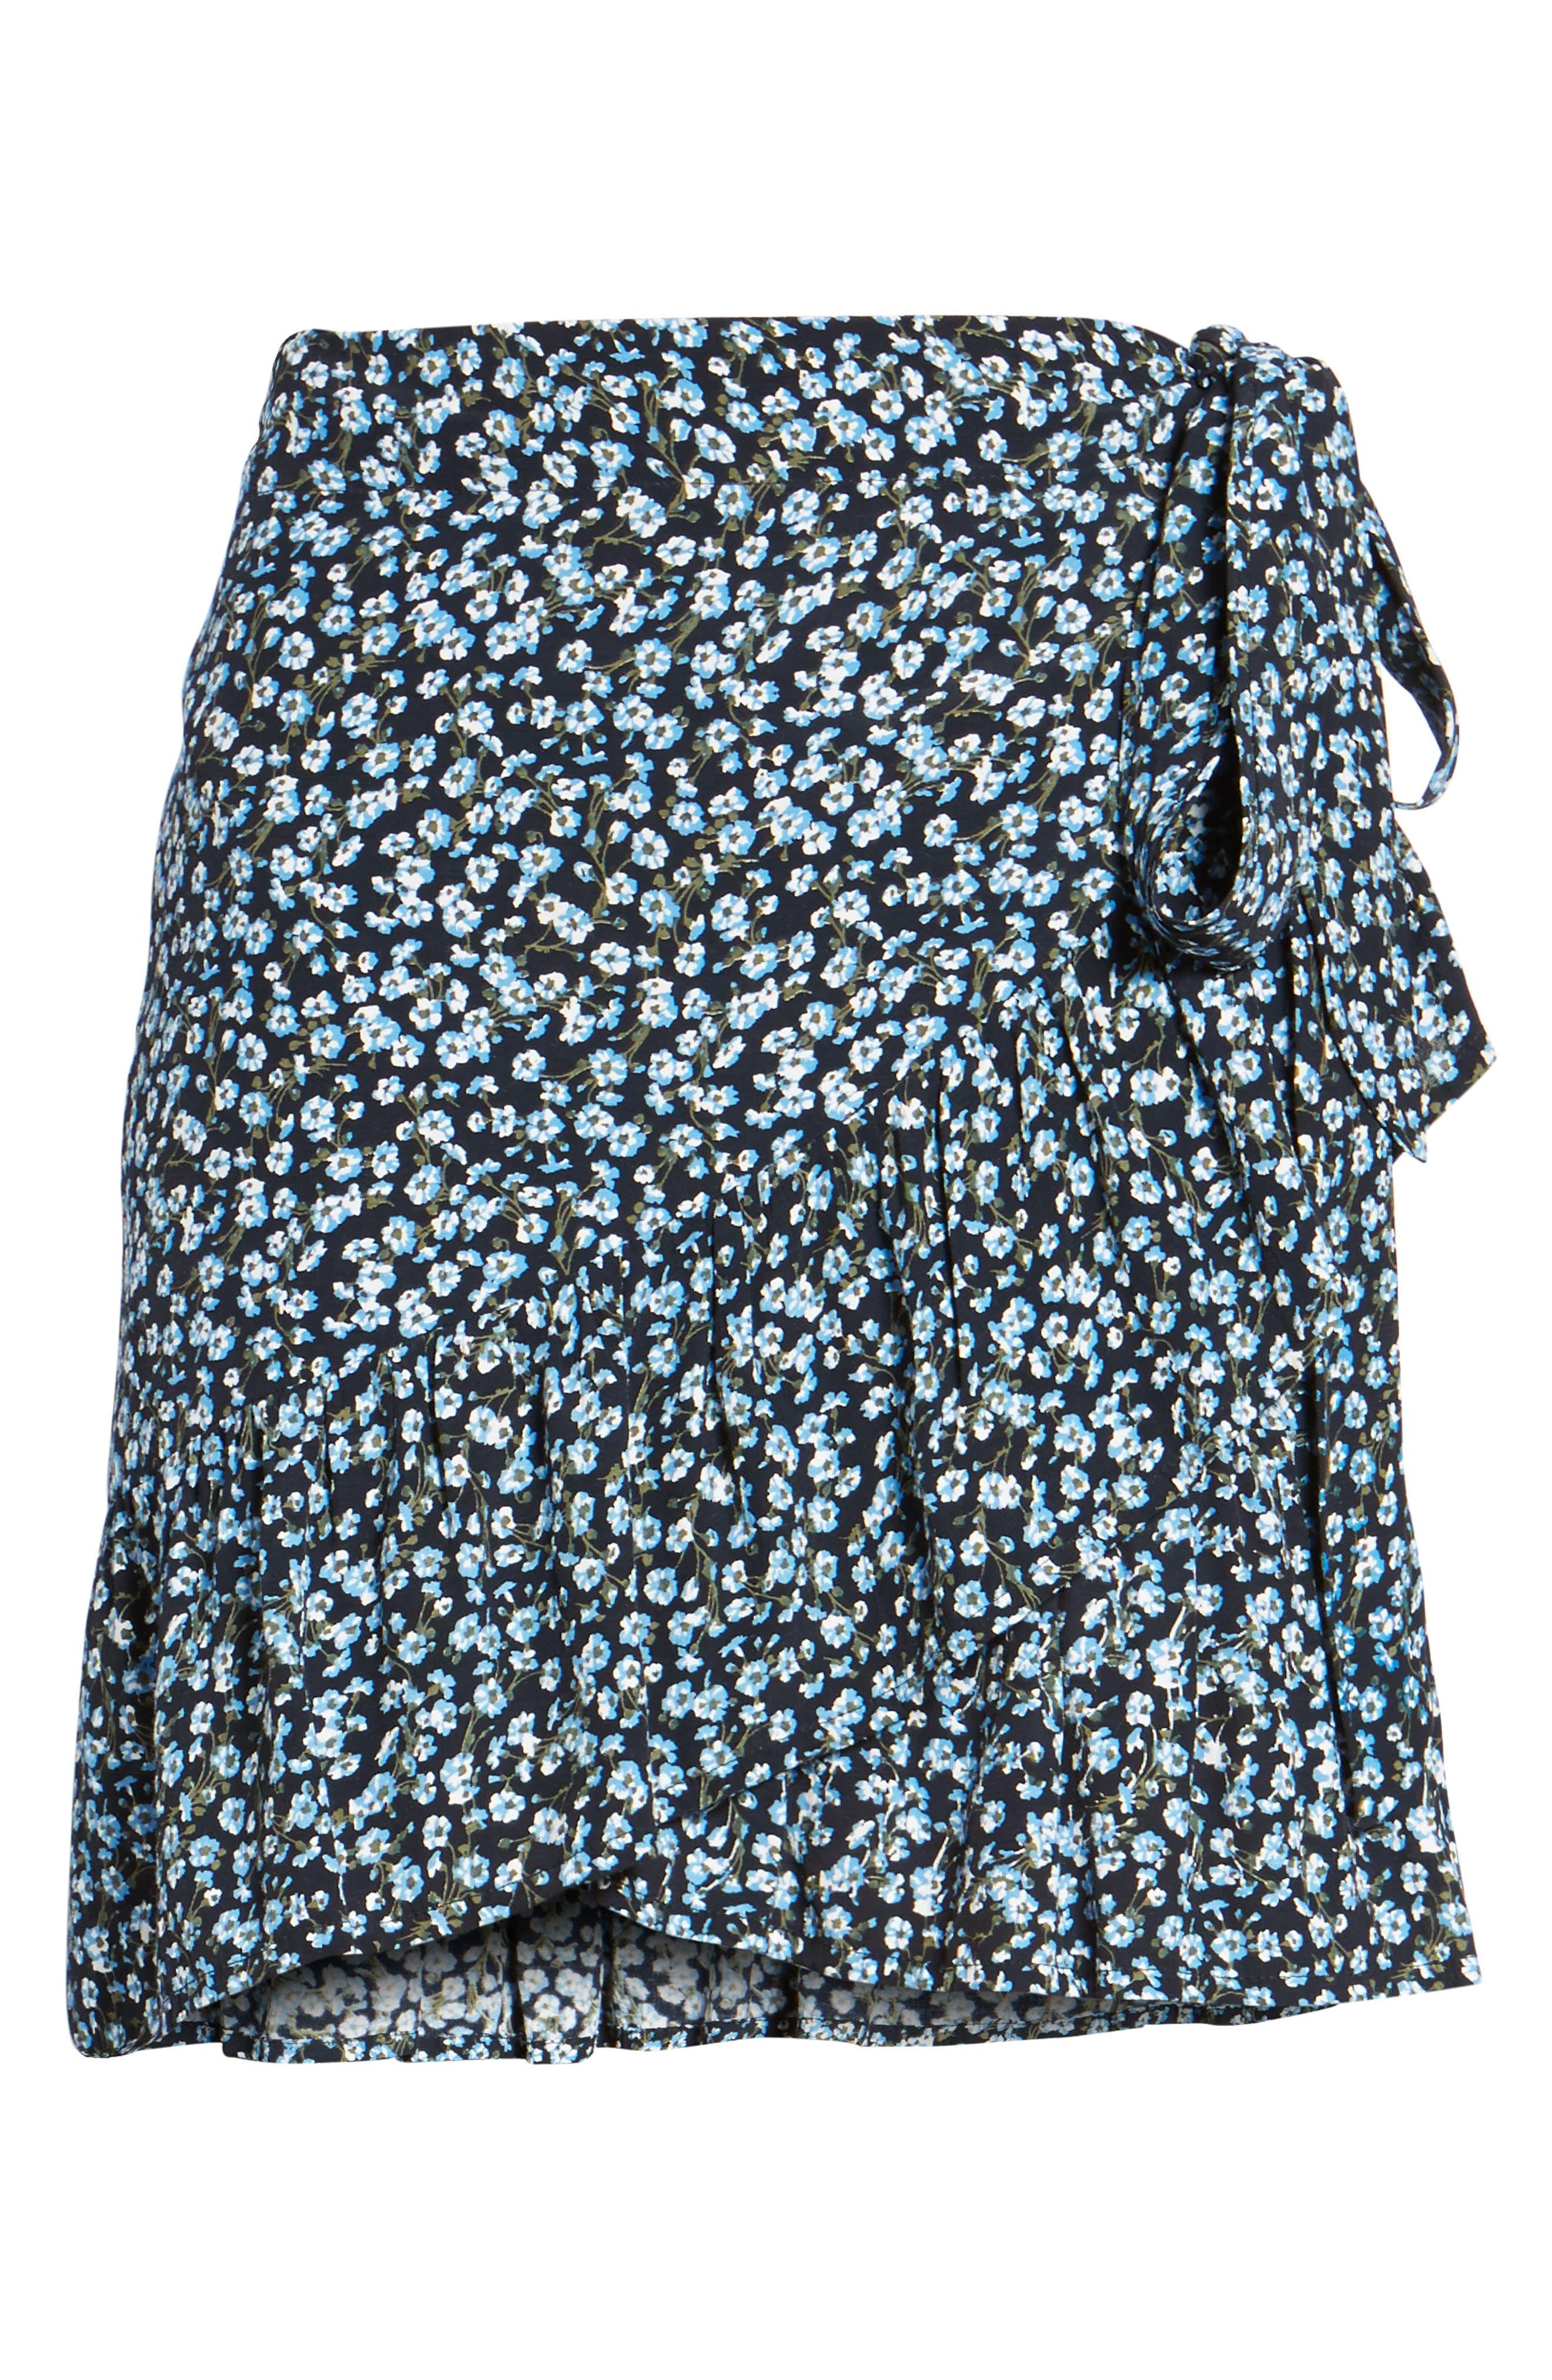 Gilda Floral Skirt,                             Alternate thumbnail 6, color,